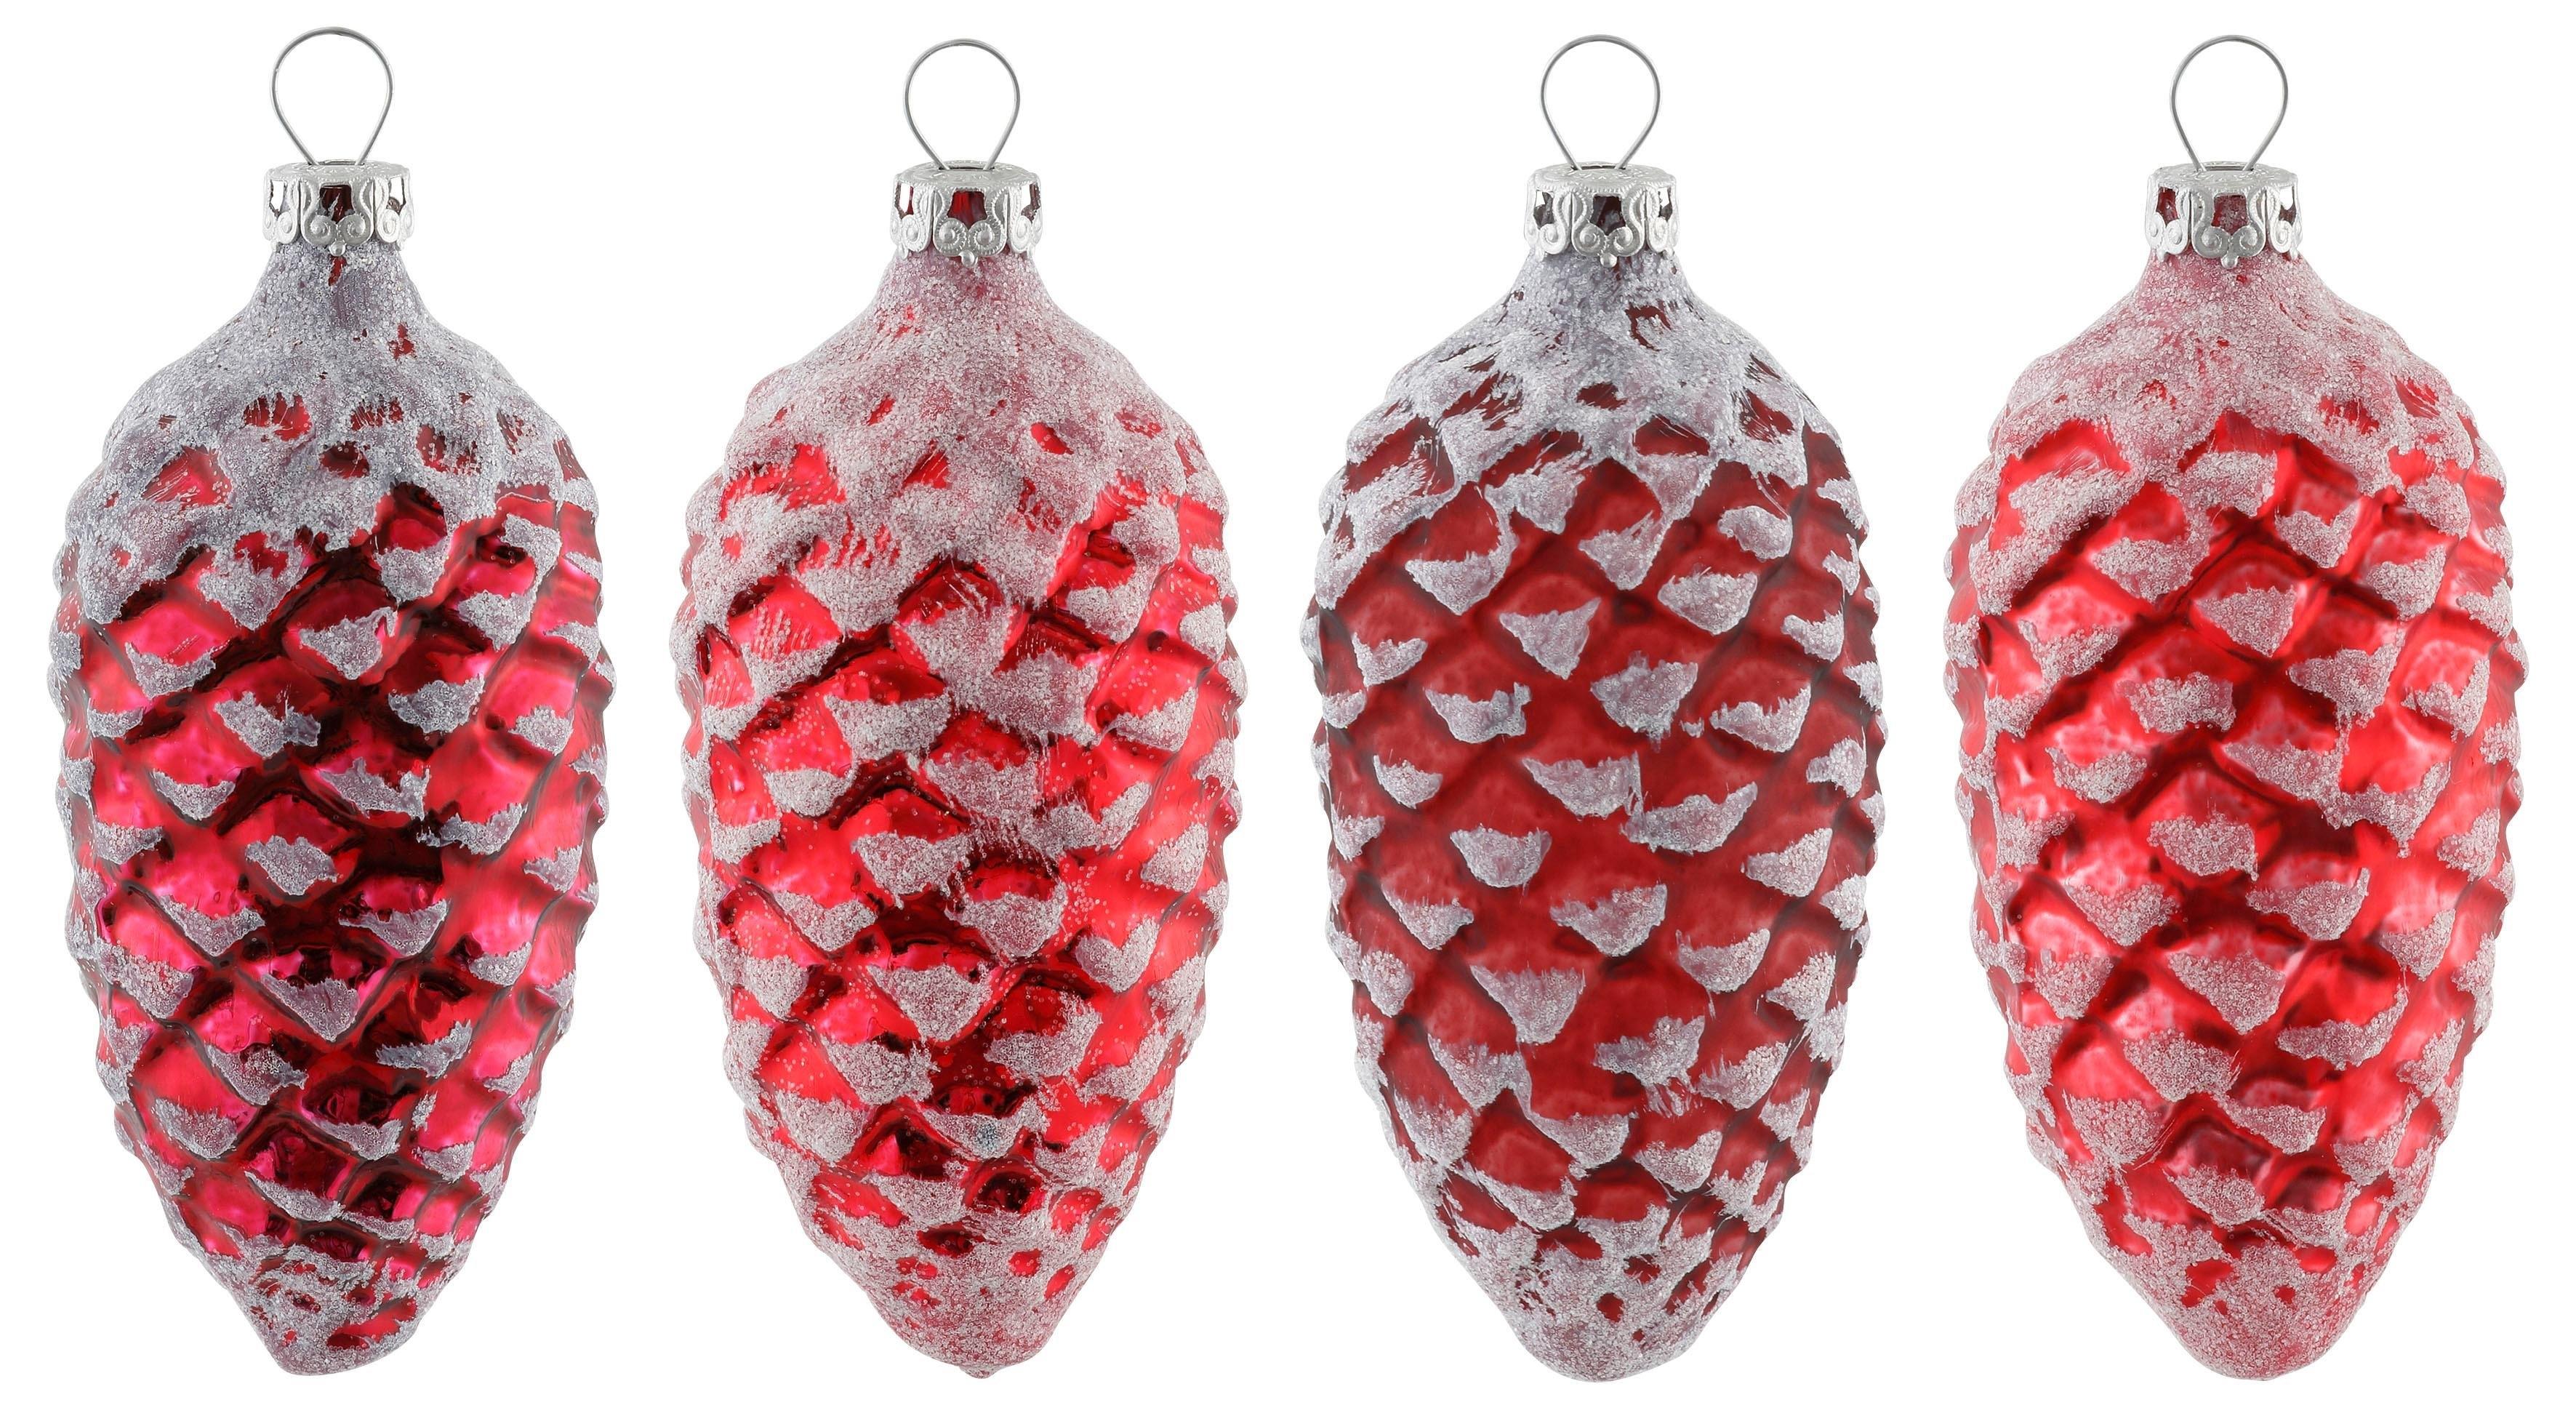 Thüringer Glasdesign kerstboomversiering 'Advent' (4-delig) online kopen op otto.nl